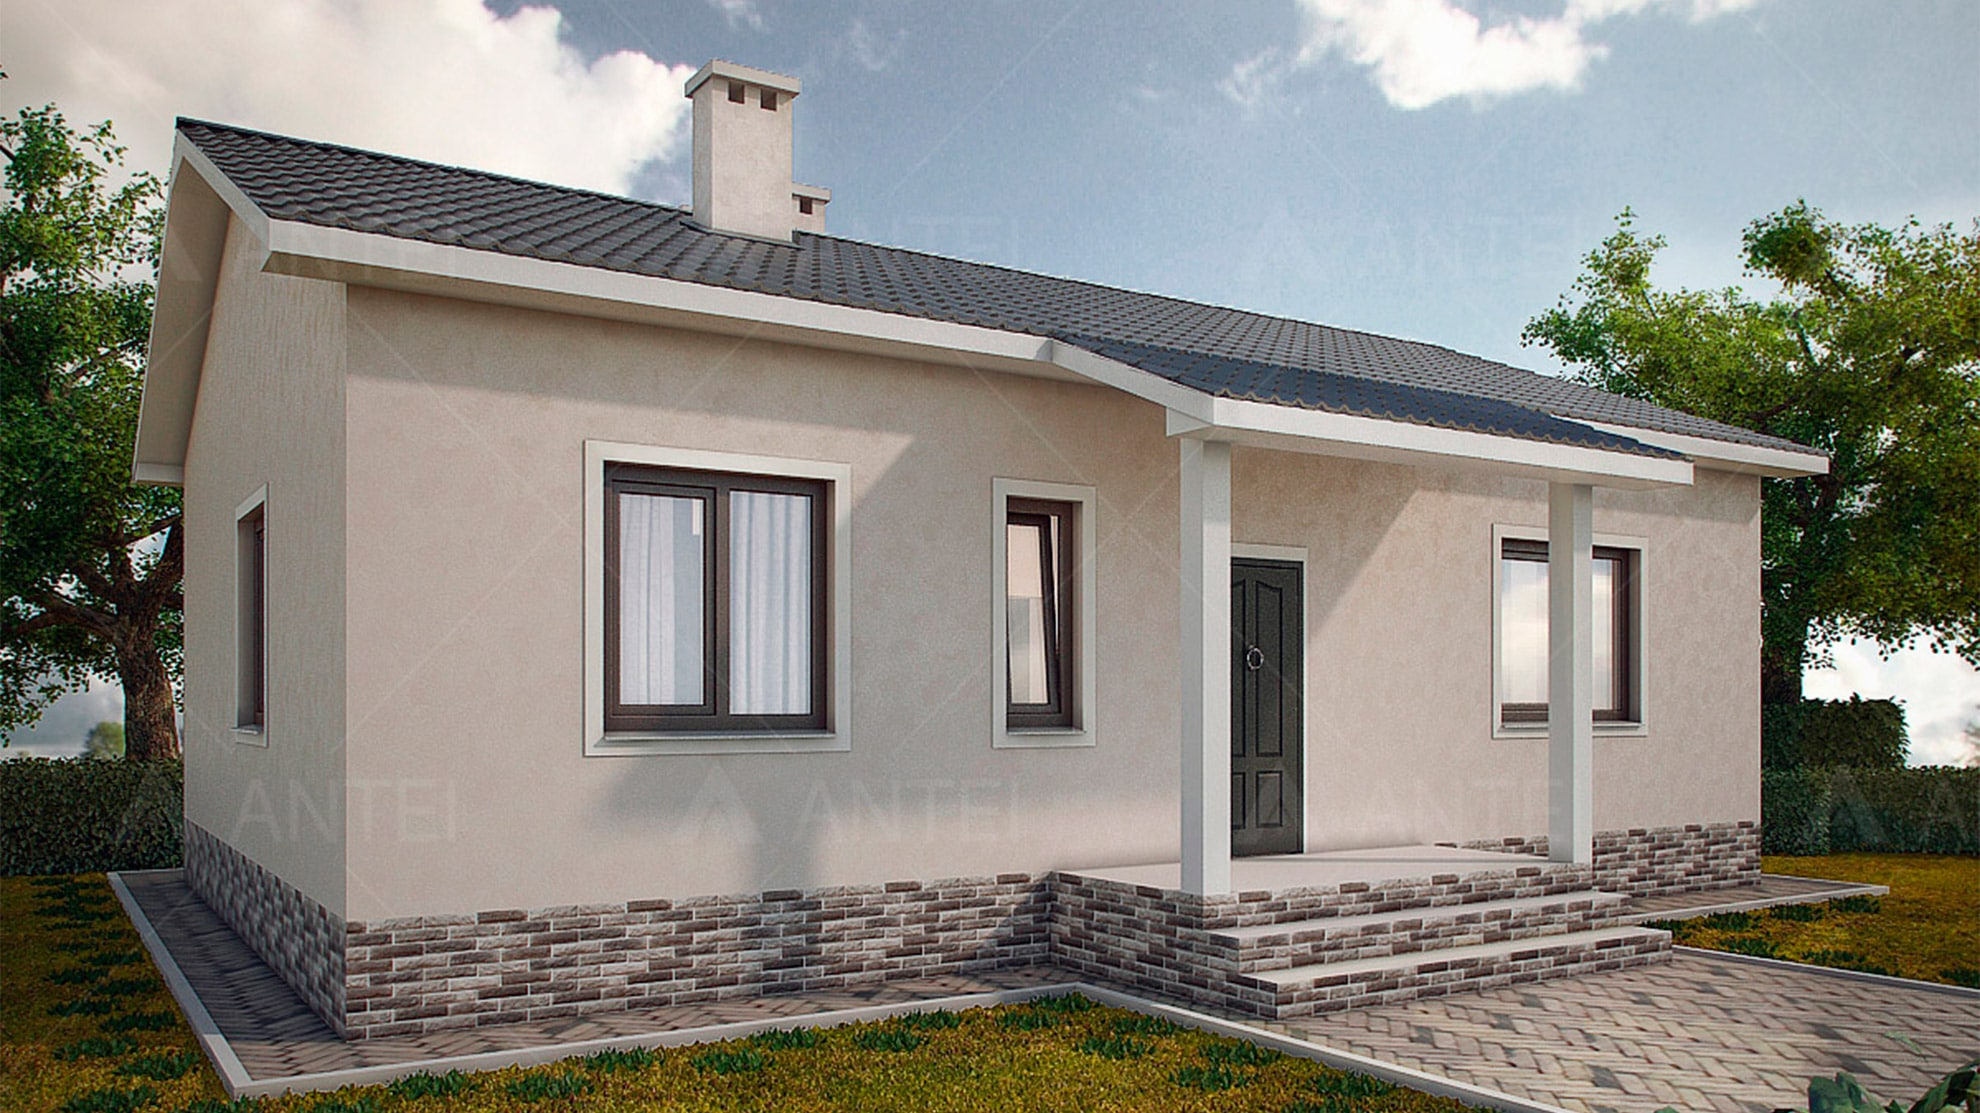 Проект одноэтажного дома «КО-4» - фото №1